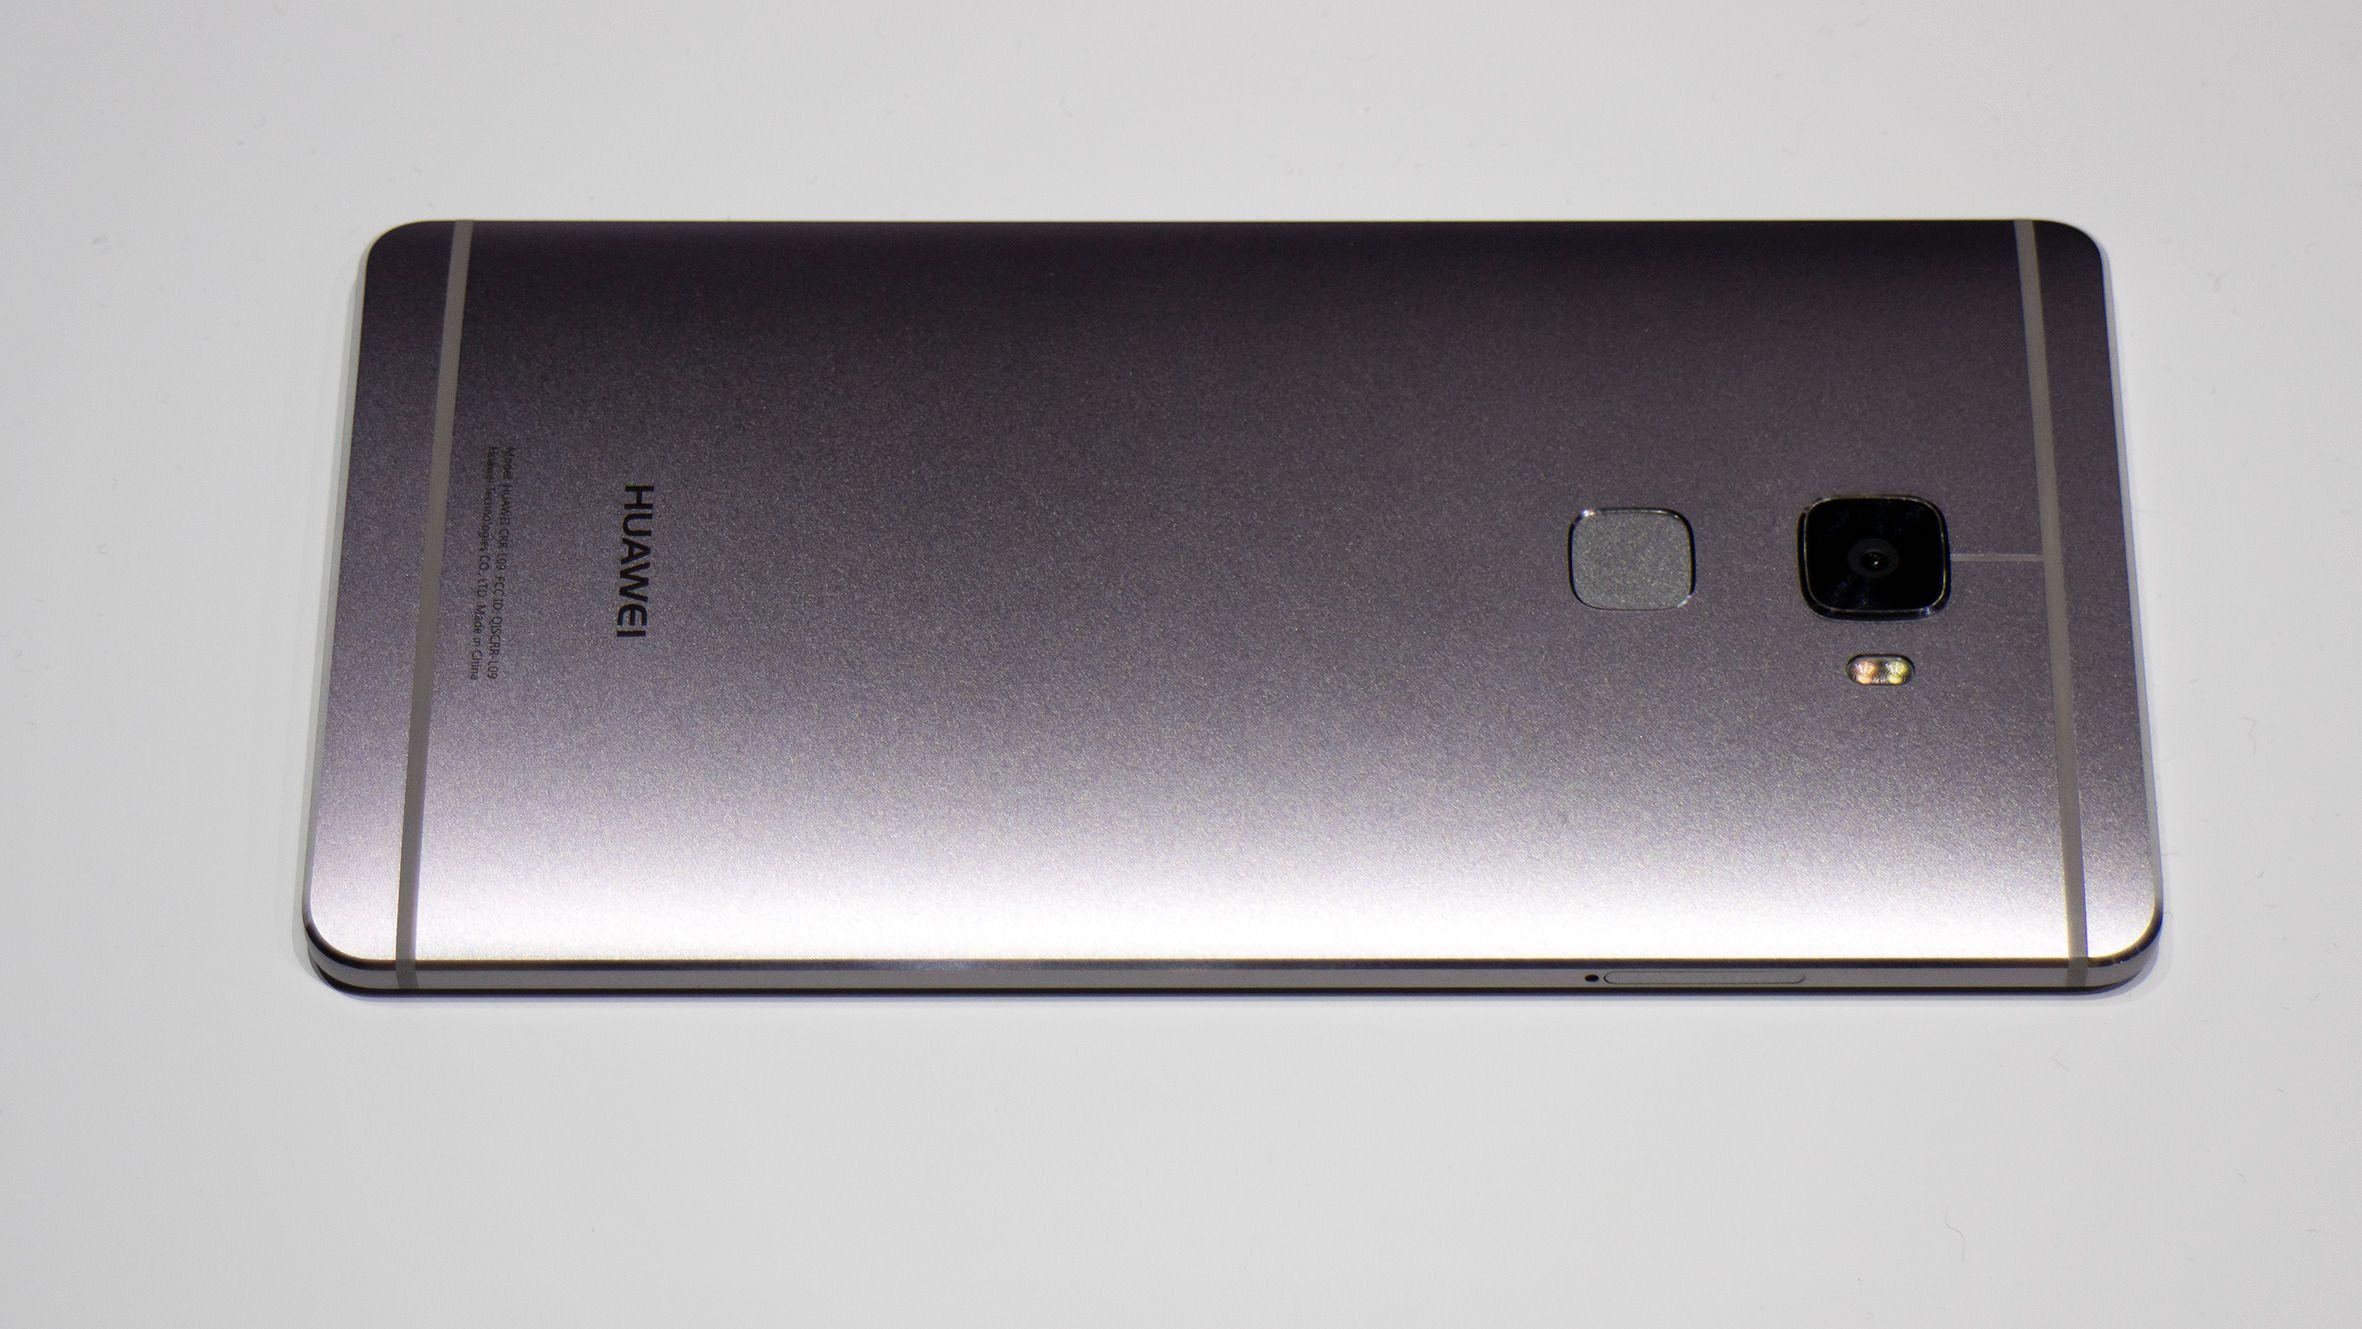 En ren og avrundet metall bakside. Ikke ulik HTC M9. Foto: Odd Richard Valmot, Tek.no